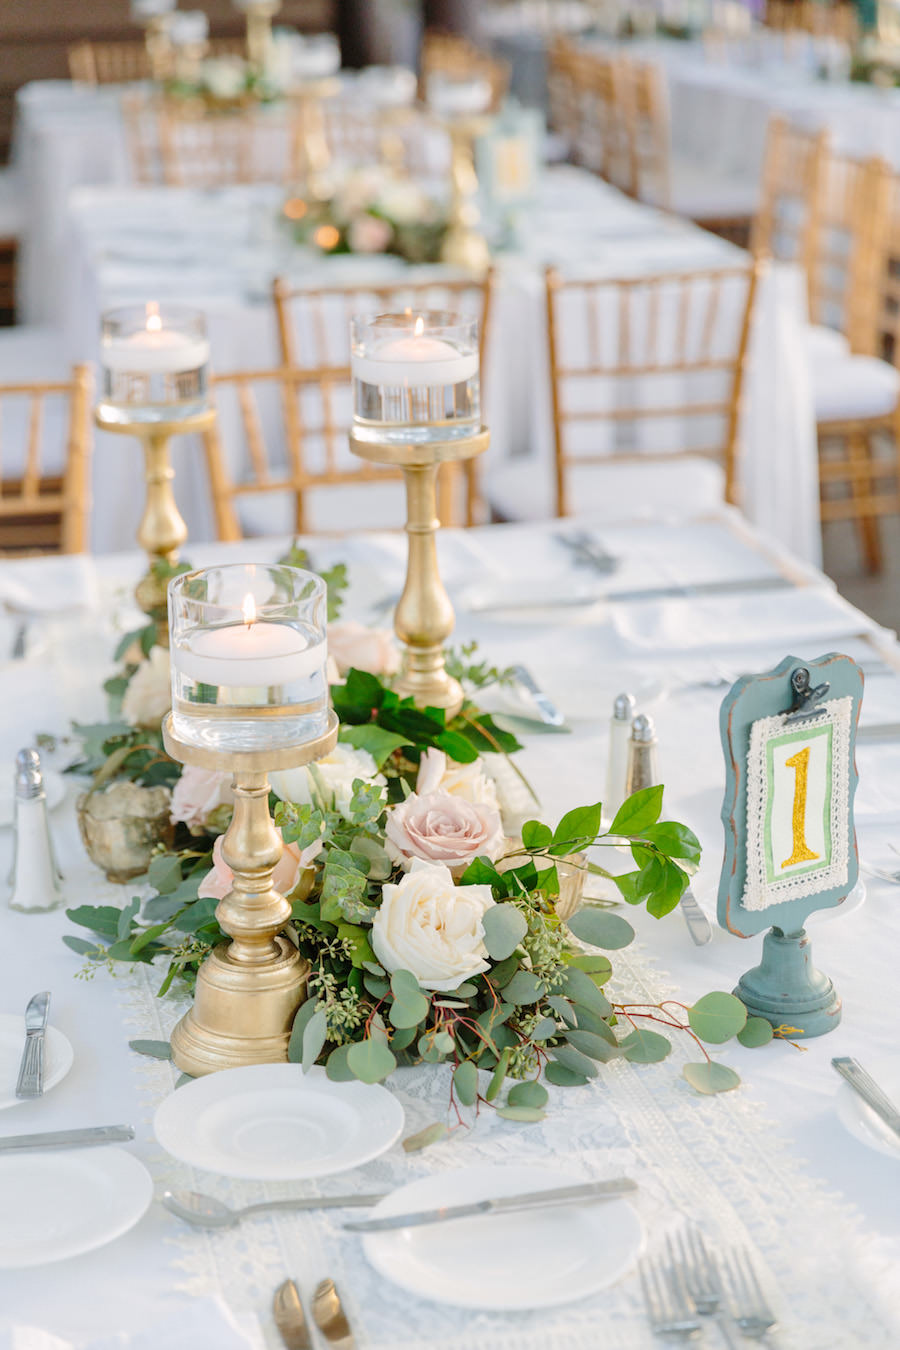 Elegant, Destination Beach Wedding Reception with Gold, Ivory and Blush Centerpieces   Hotel Wedding Venue Hilton Clearwater Beach